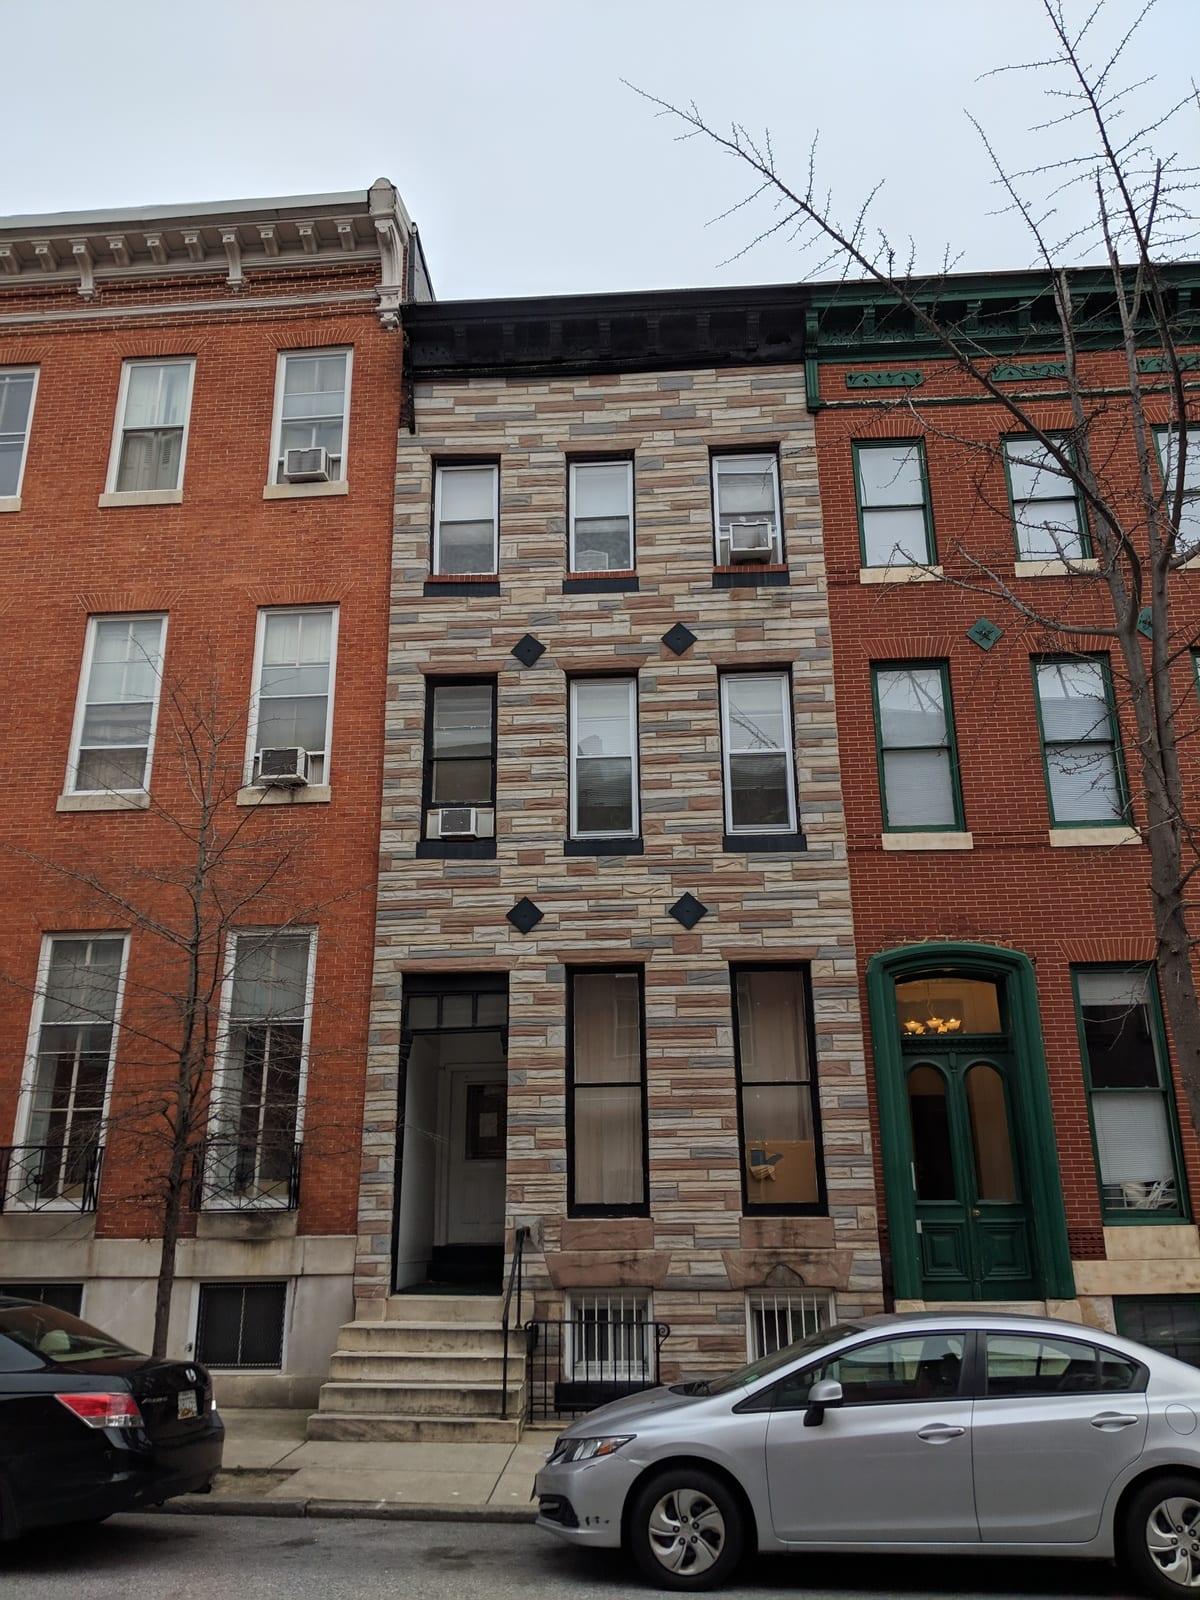 911 N. Calvert St:  Mount Vernon 4 Unit Apartment Property